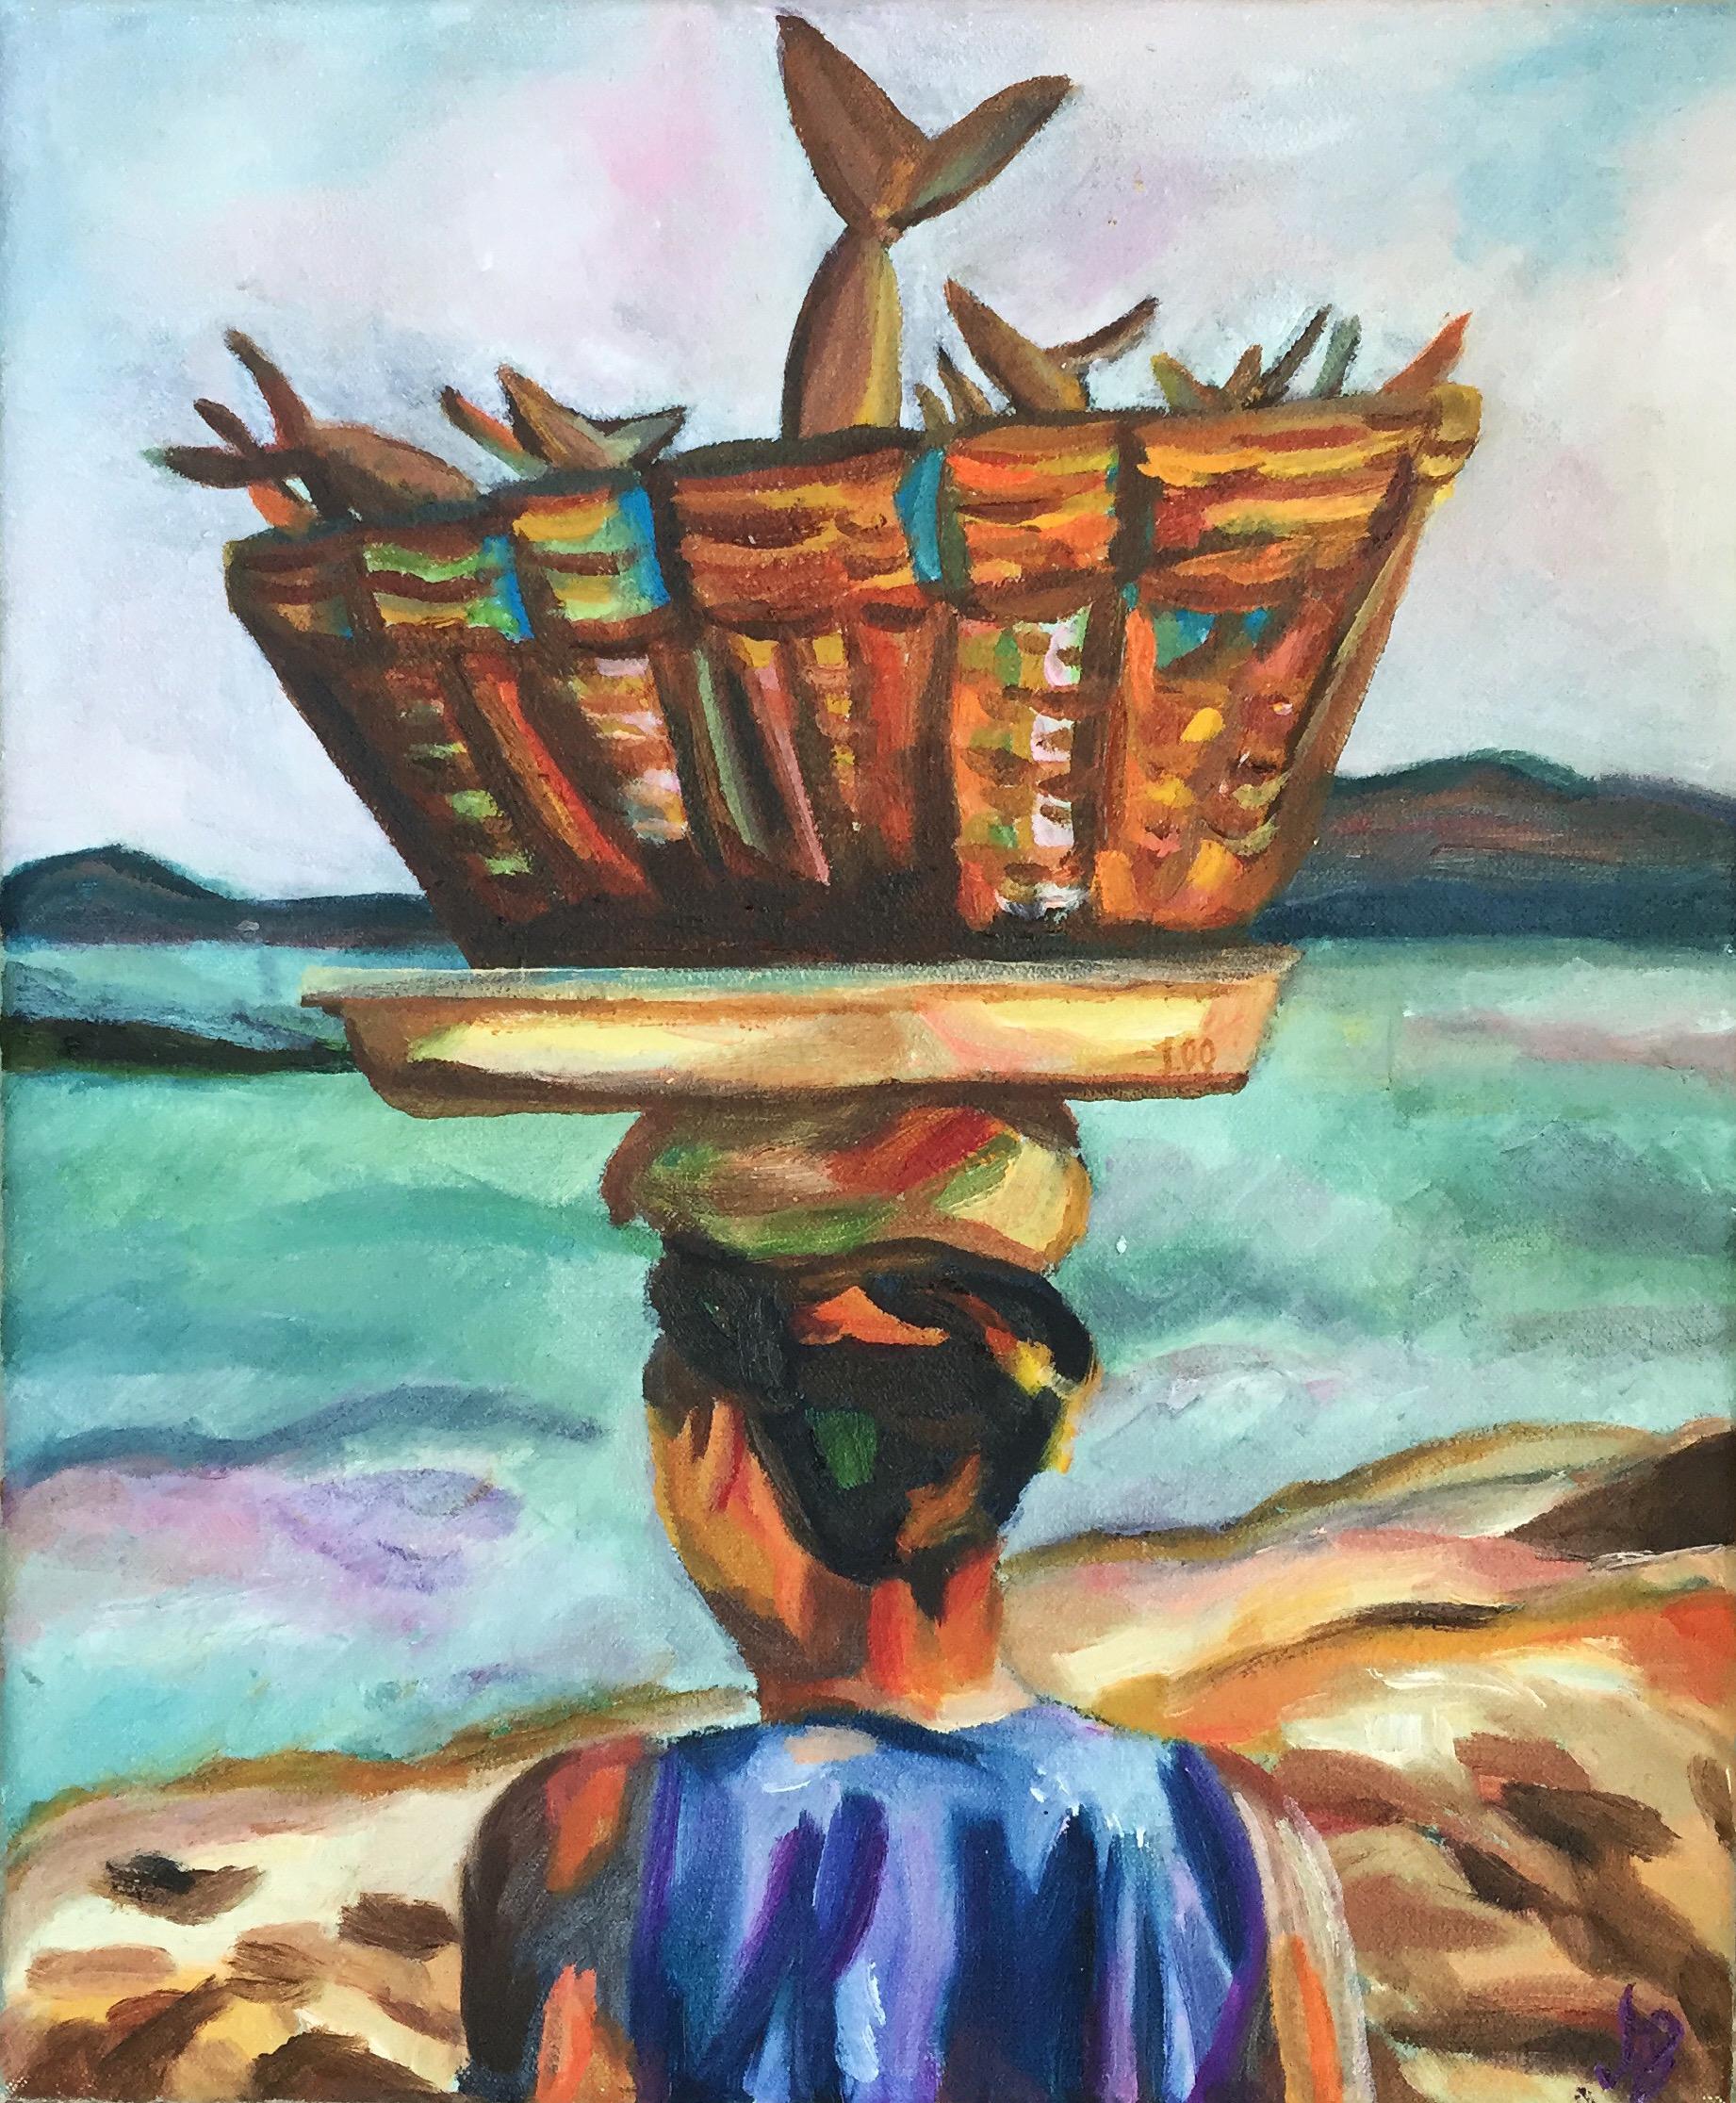 "My Sea | Oil on canvas | 9.5 x 11"" | 2015"